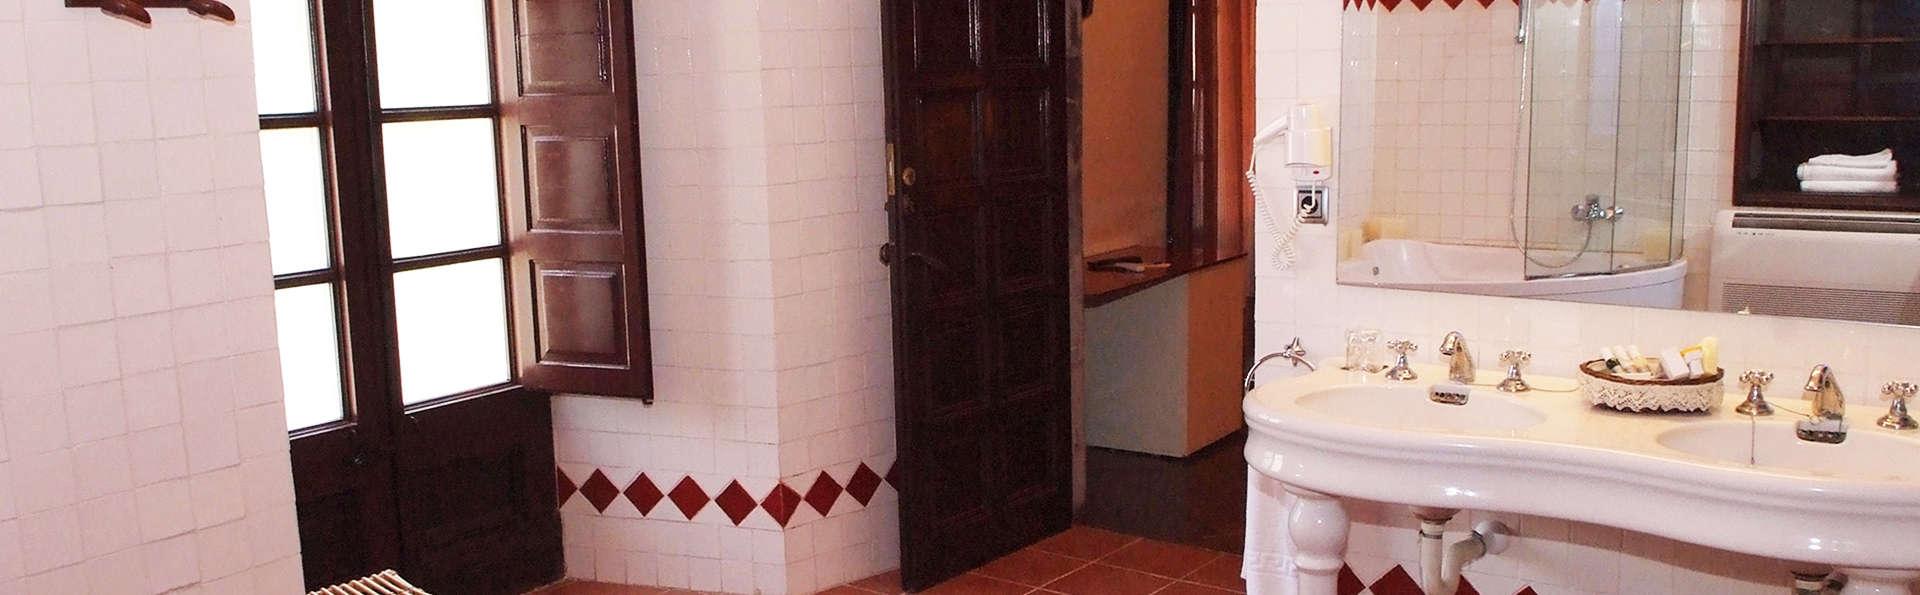 RVHotels Palau lo Mirador - EDIT_bath.jpg